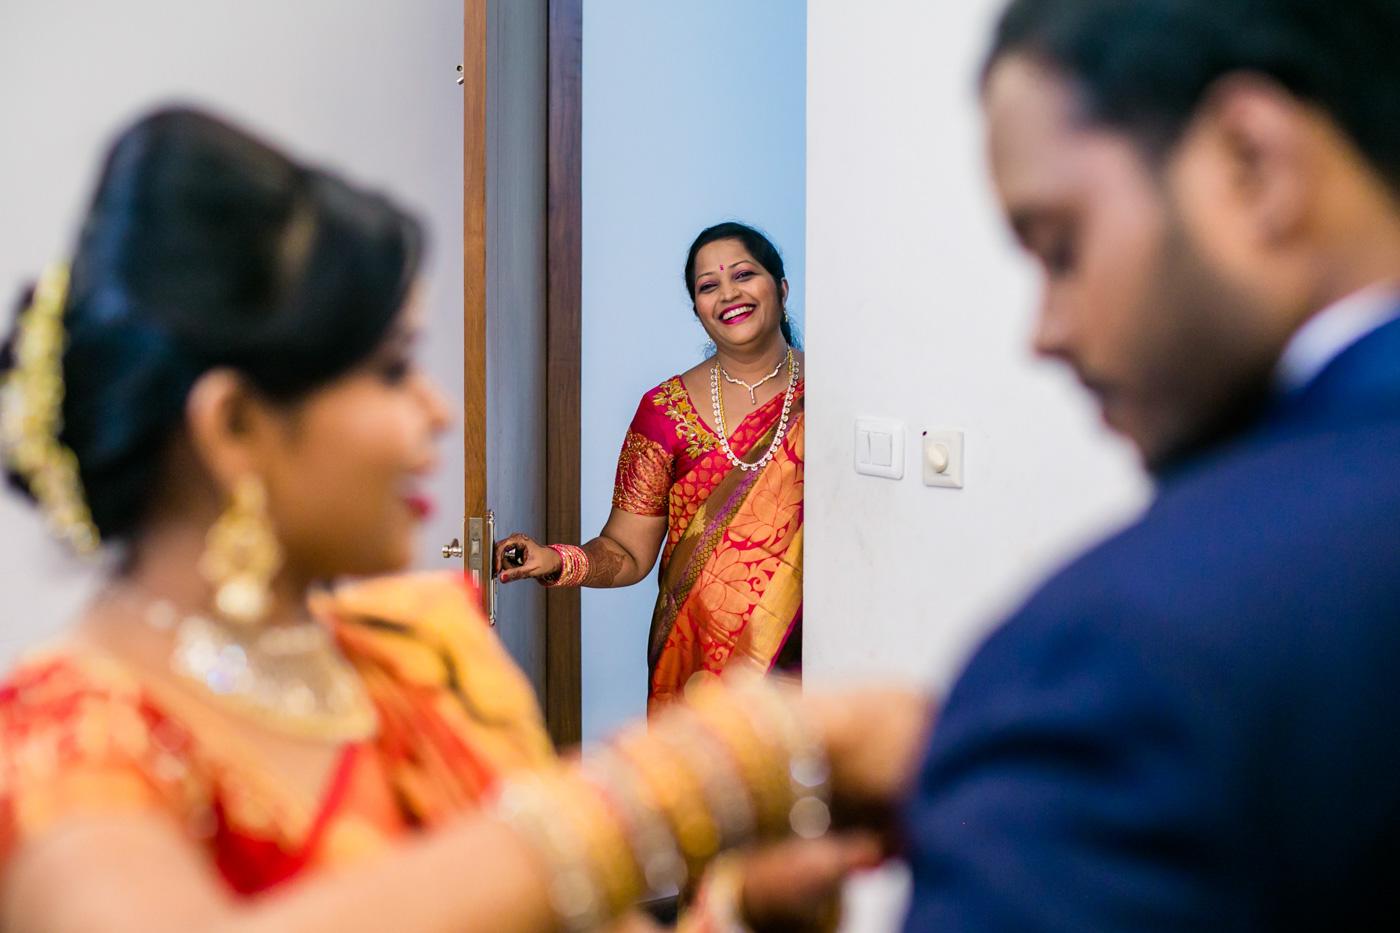 South_Indian_Bangalore_Wedding_Candid_Photographer-12.jpg